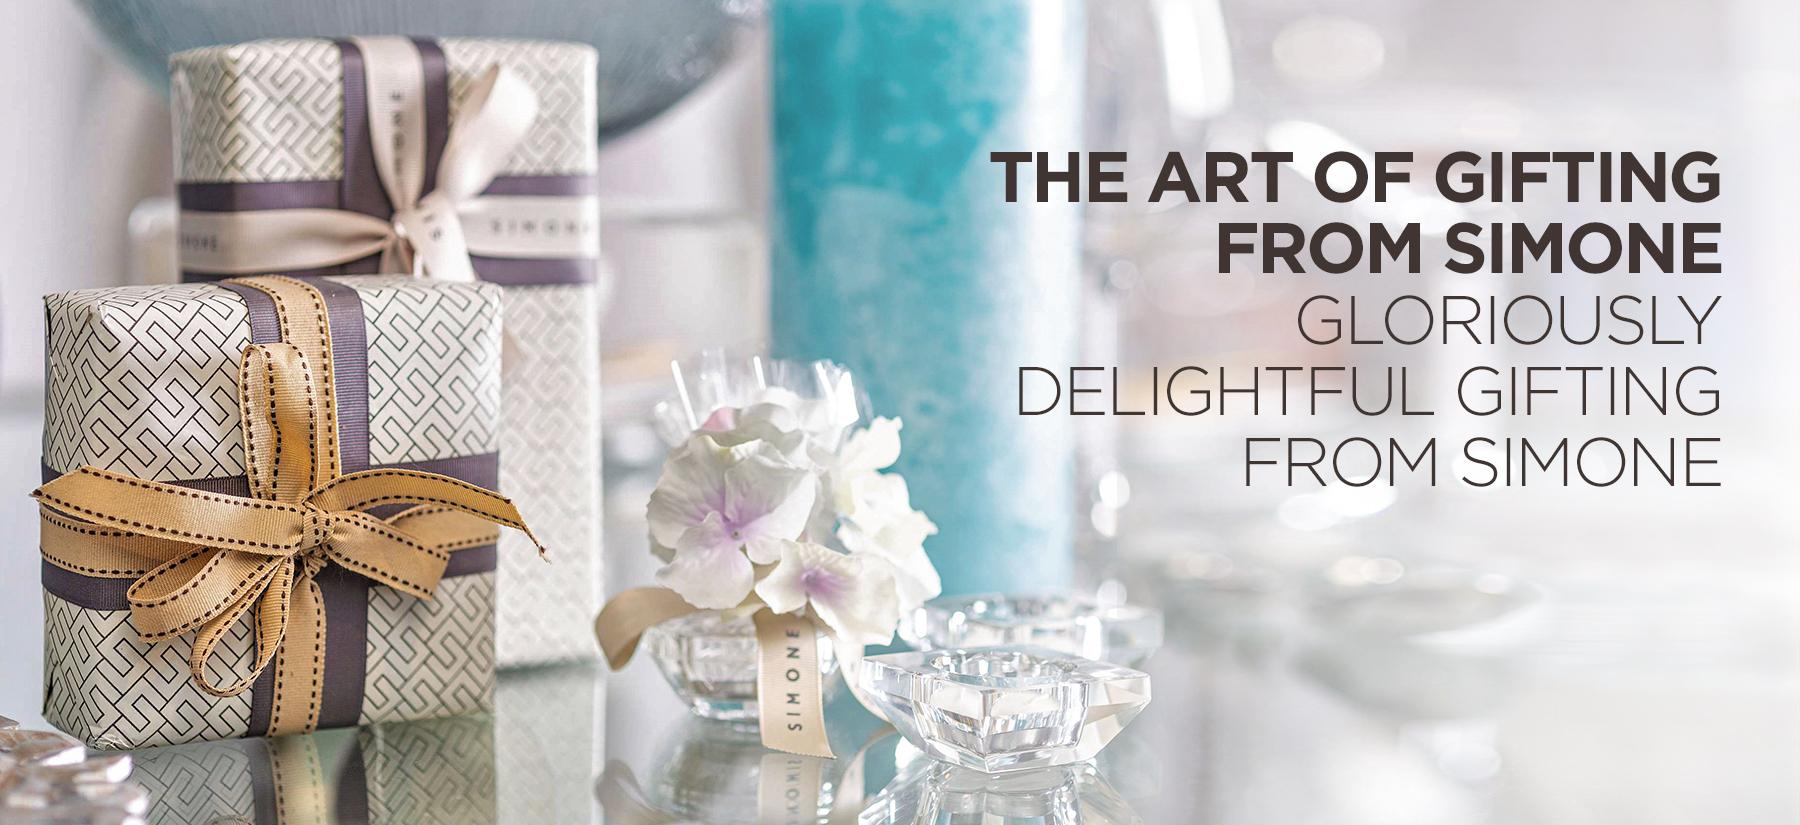 The Art of Gifting by SIMONE Mumbai